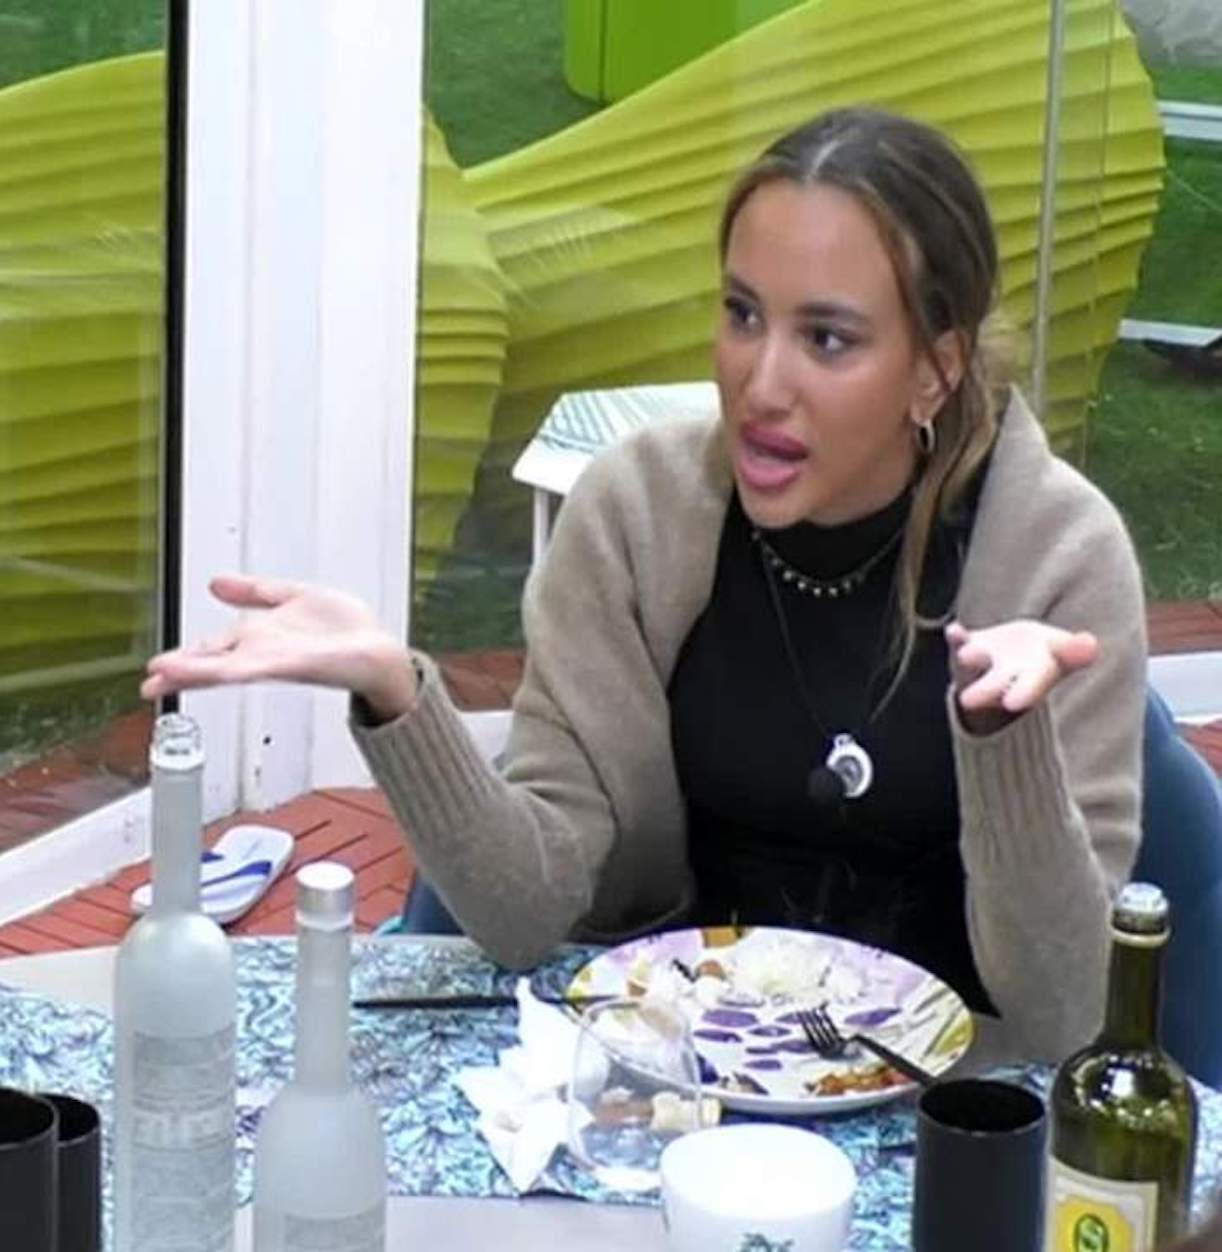 Francesca Cipriani dente tiramisu gf vip 6